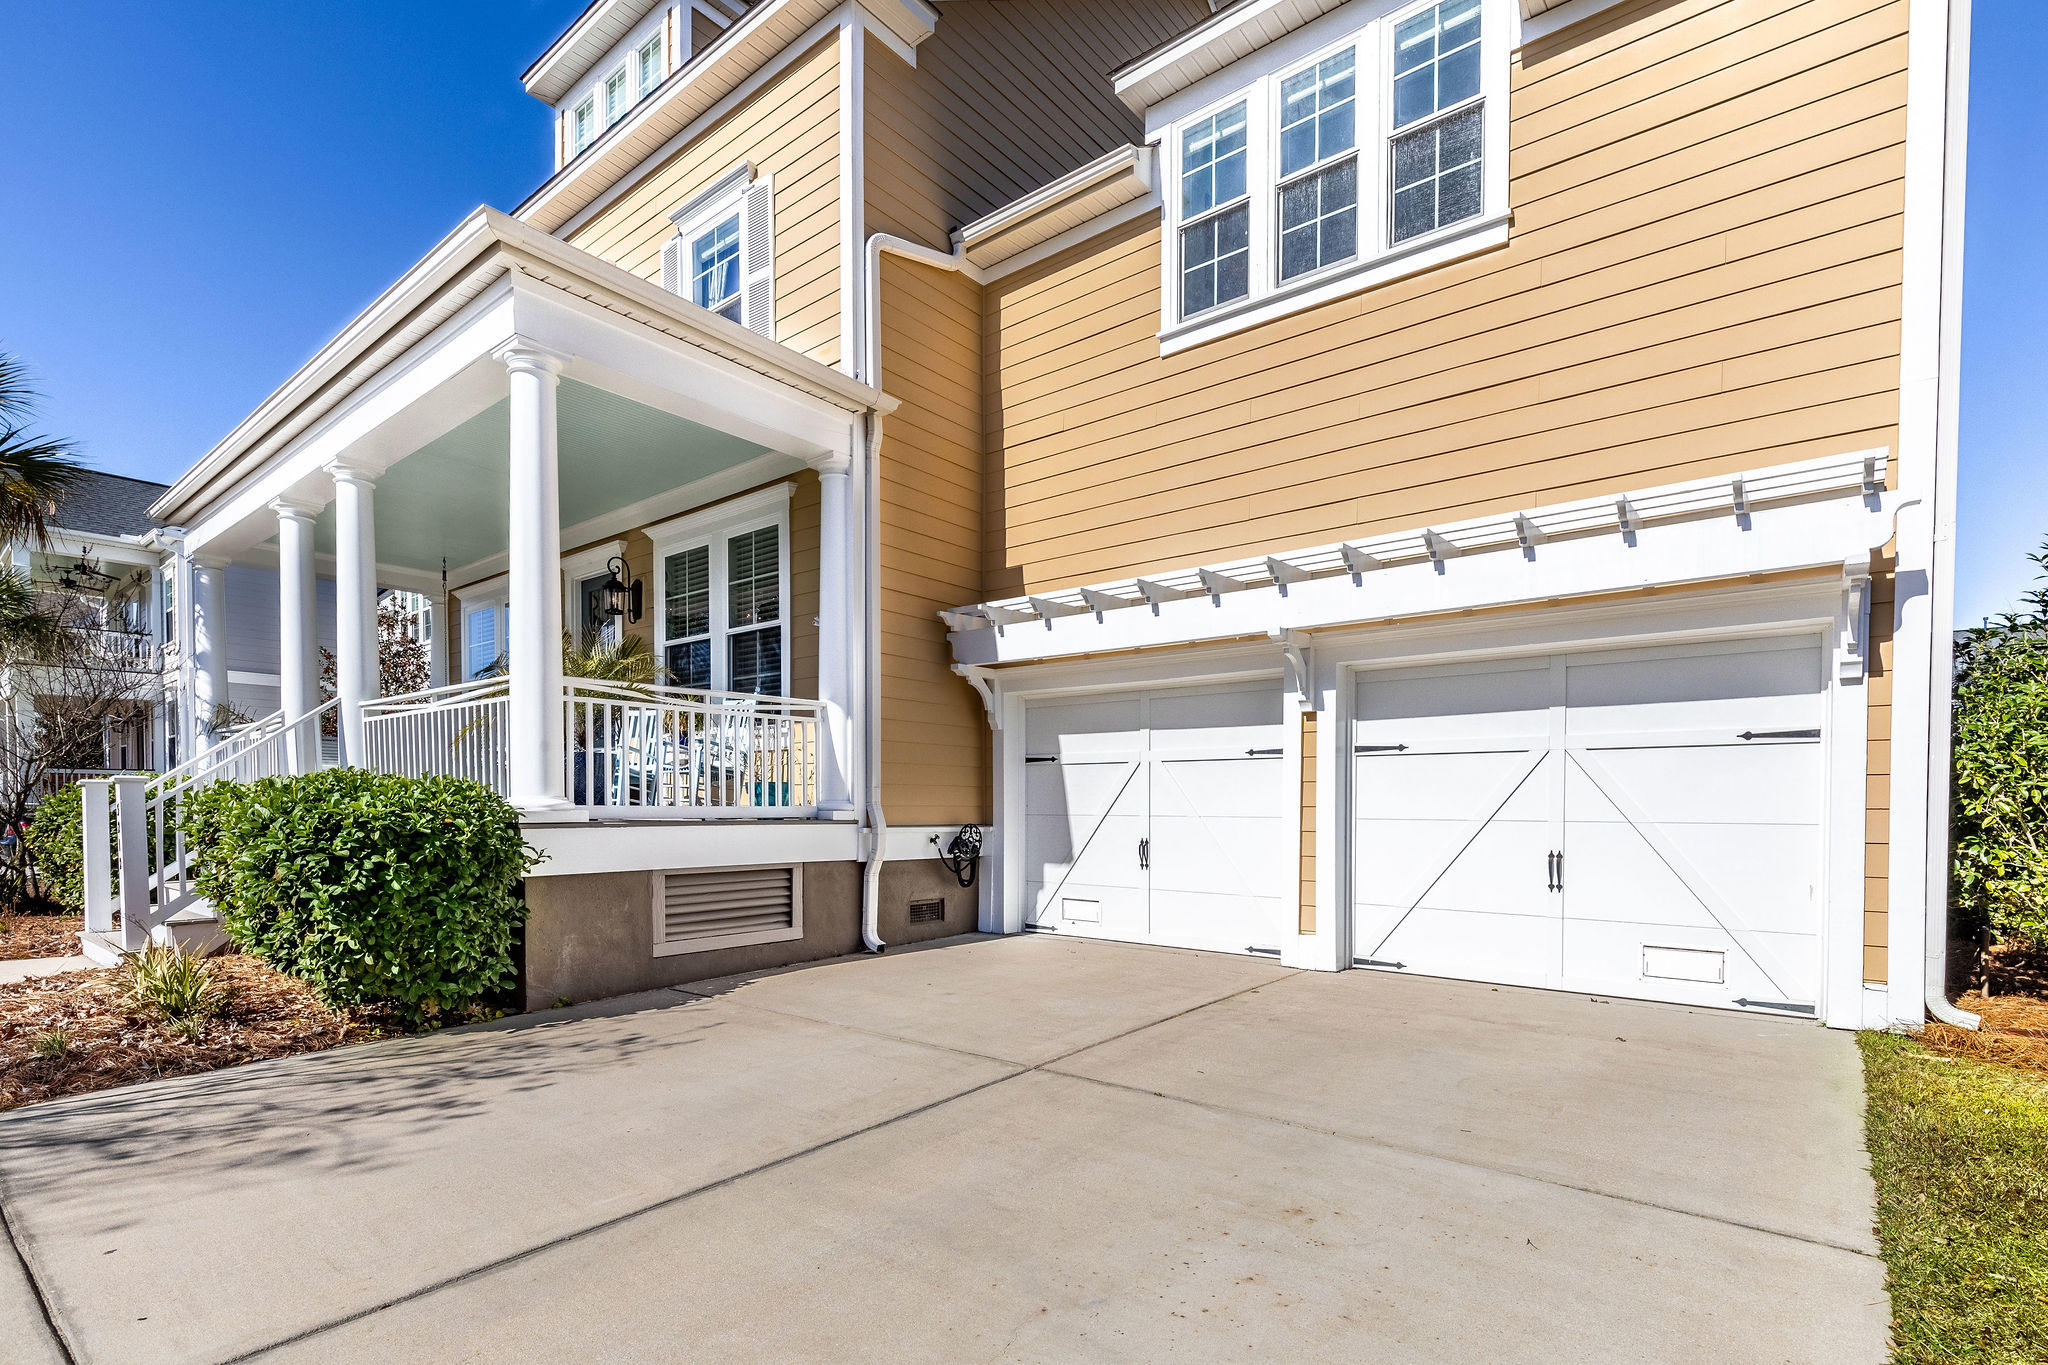 Dunes West Homes For Sale - 3212 Hatchway, Mount Pleasant, SC - 45